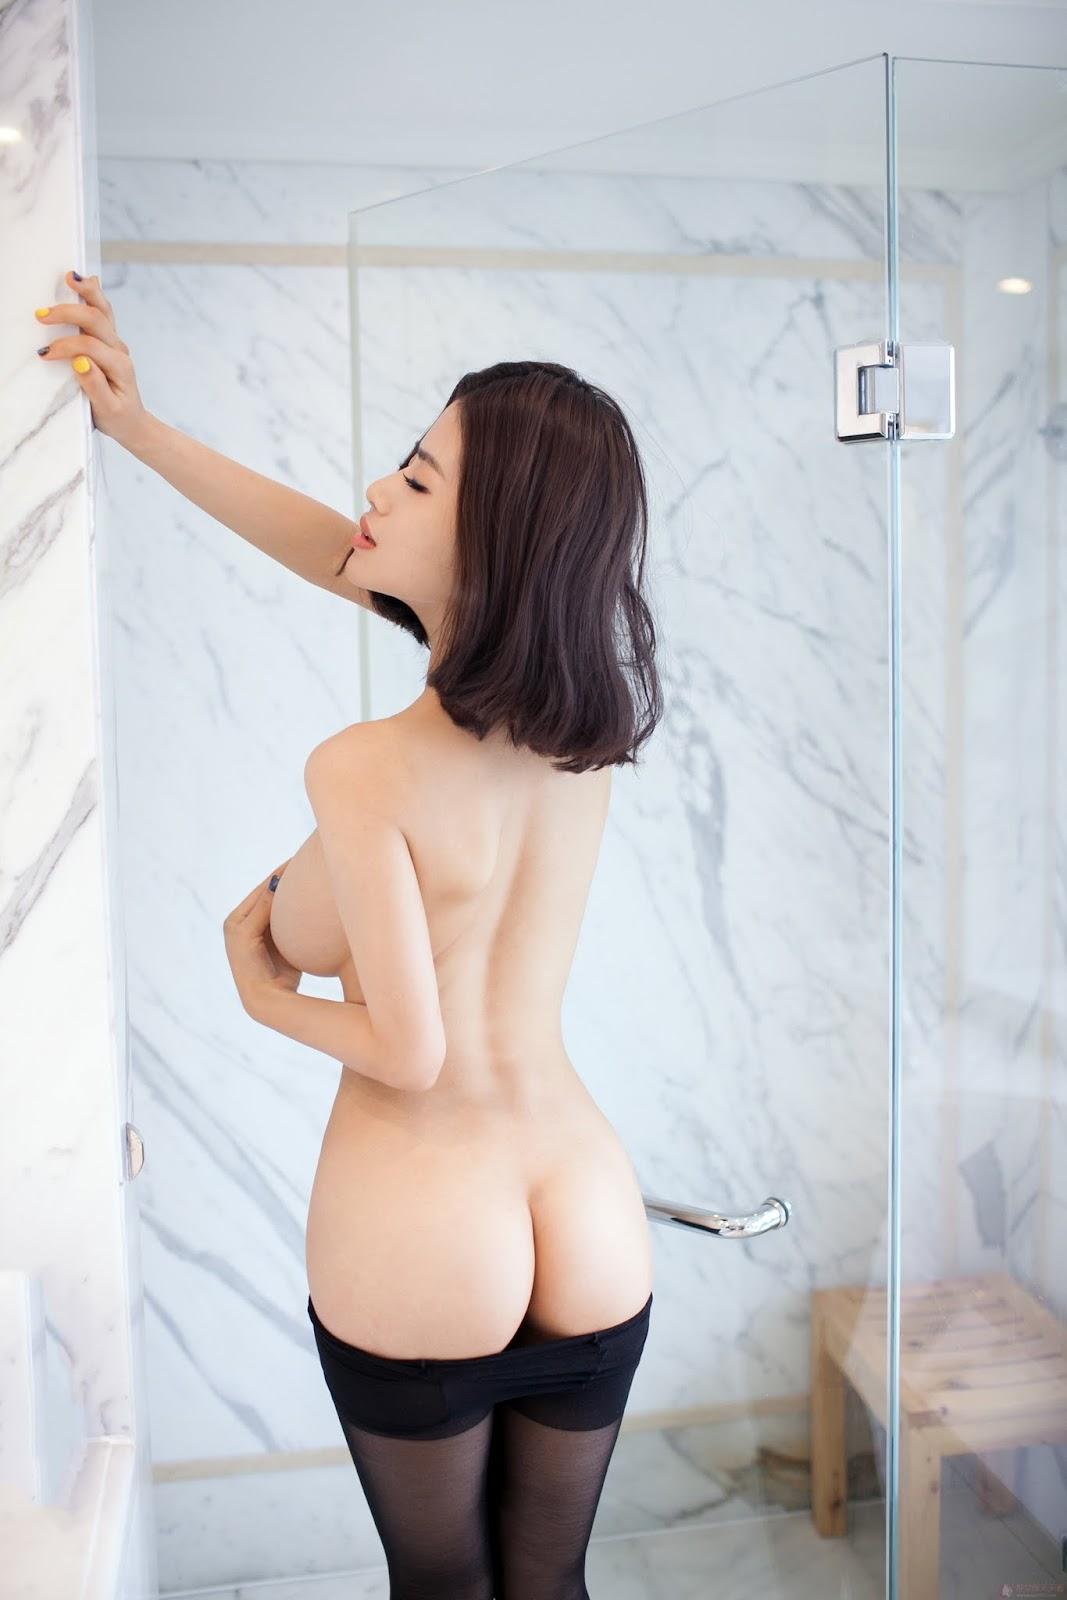 %252B%25C2%25A6%252B%2529%2B%252809%2529 - Hot Girl TUIGIRL NO.53 Sexy